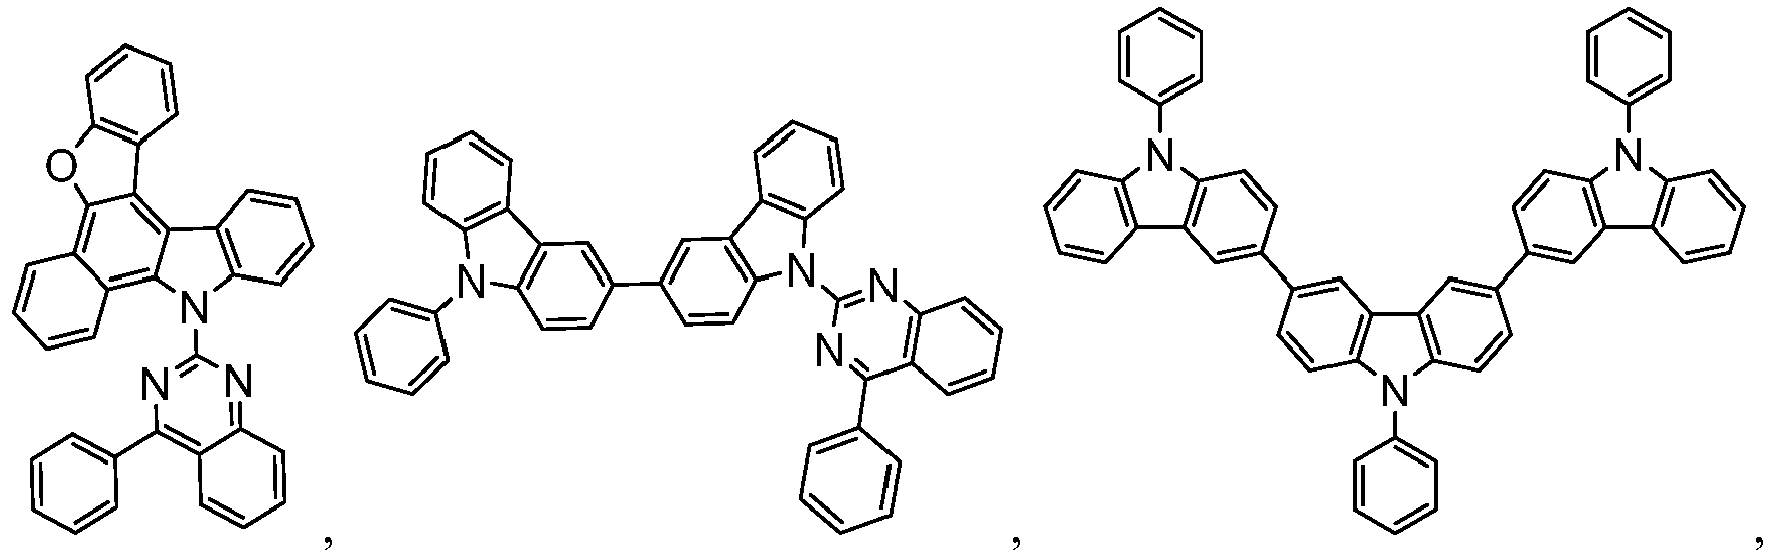 Figure imgb0826